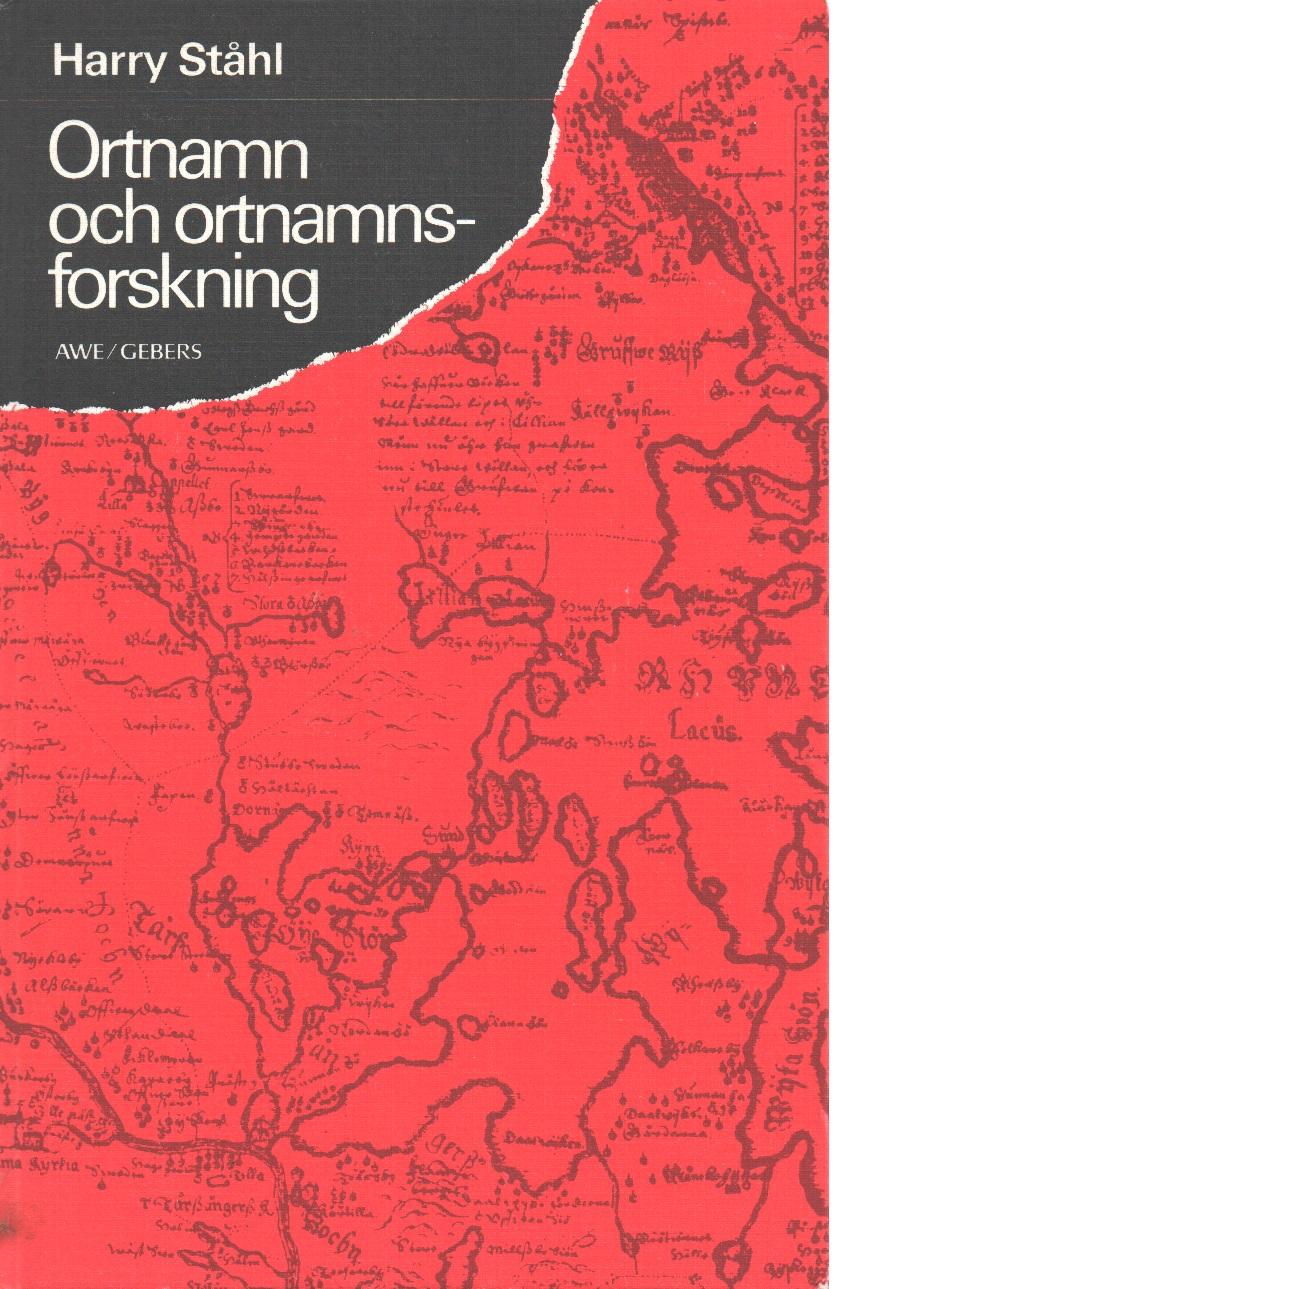 Ortnamn och ortnamnsforskning - Ståhl, Harry